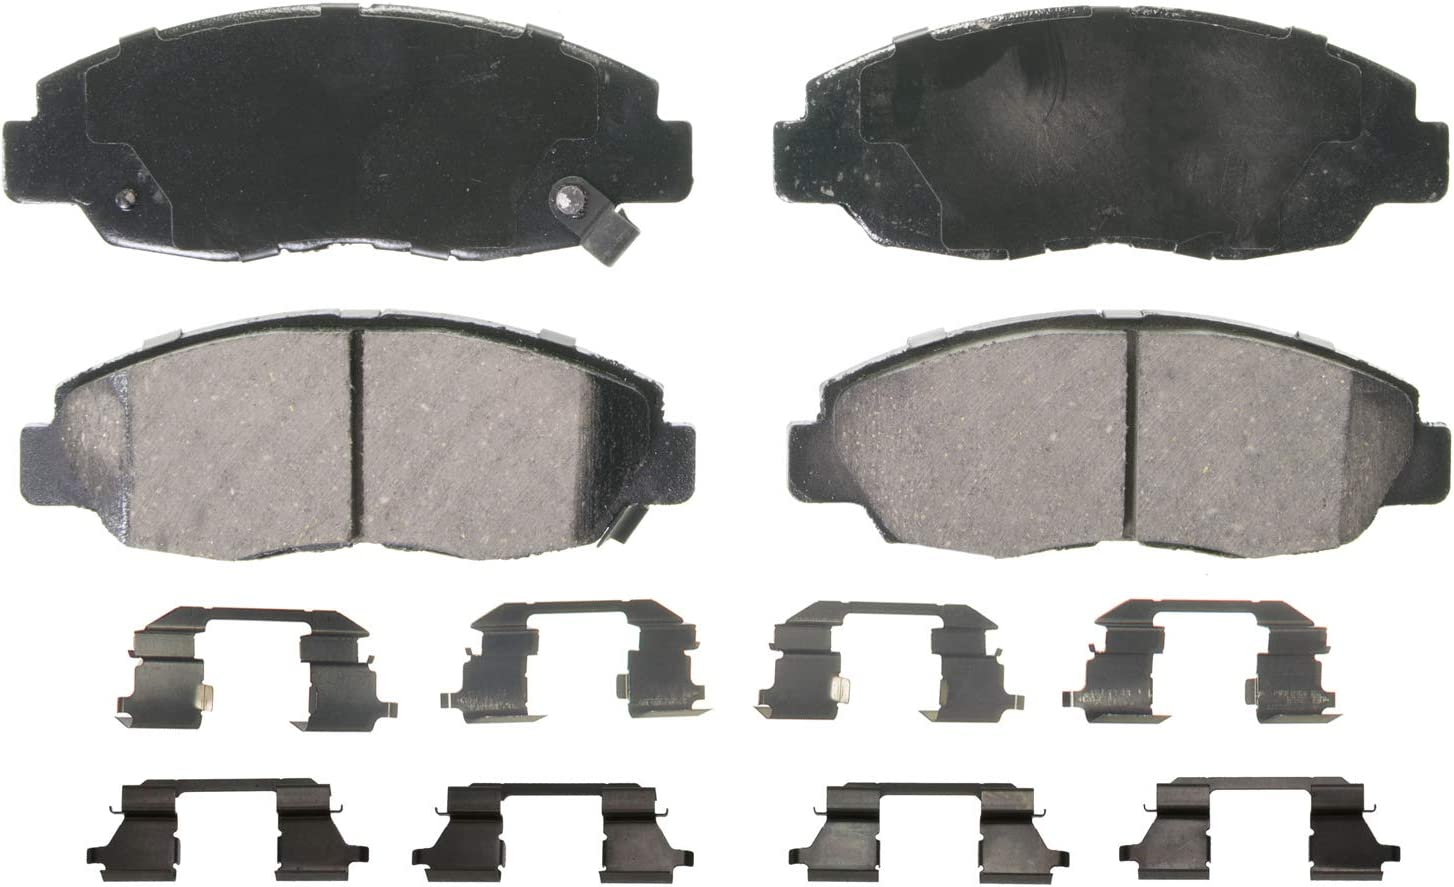 San Antonio Mall Wagner High quality QuickStop ZD764 Ceramic Disc Brake Pad Set